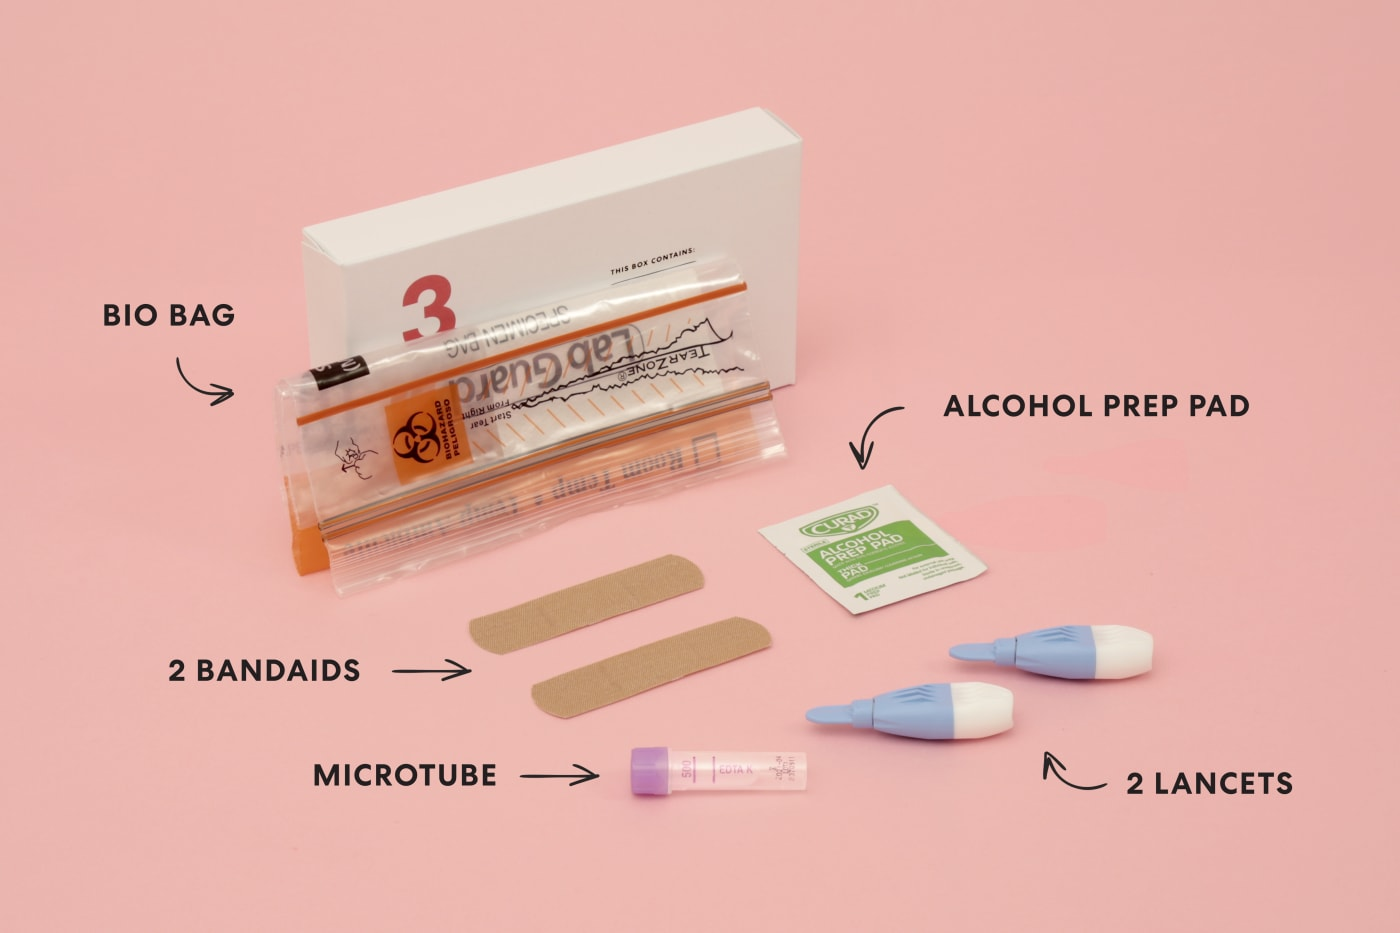 items in test kit